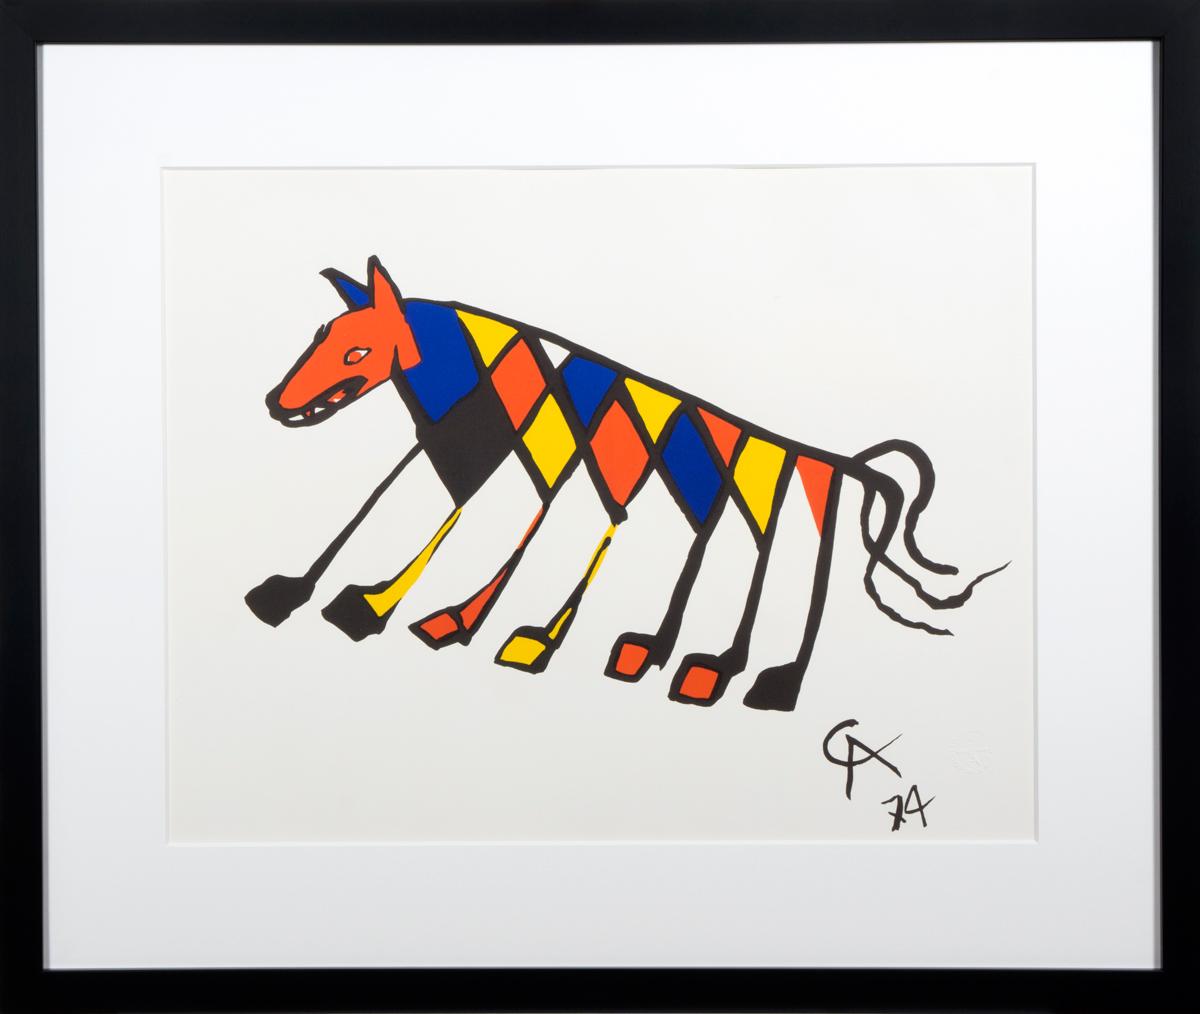 Beastie in frame